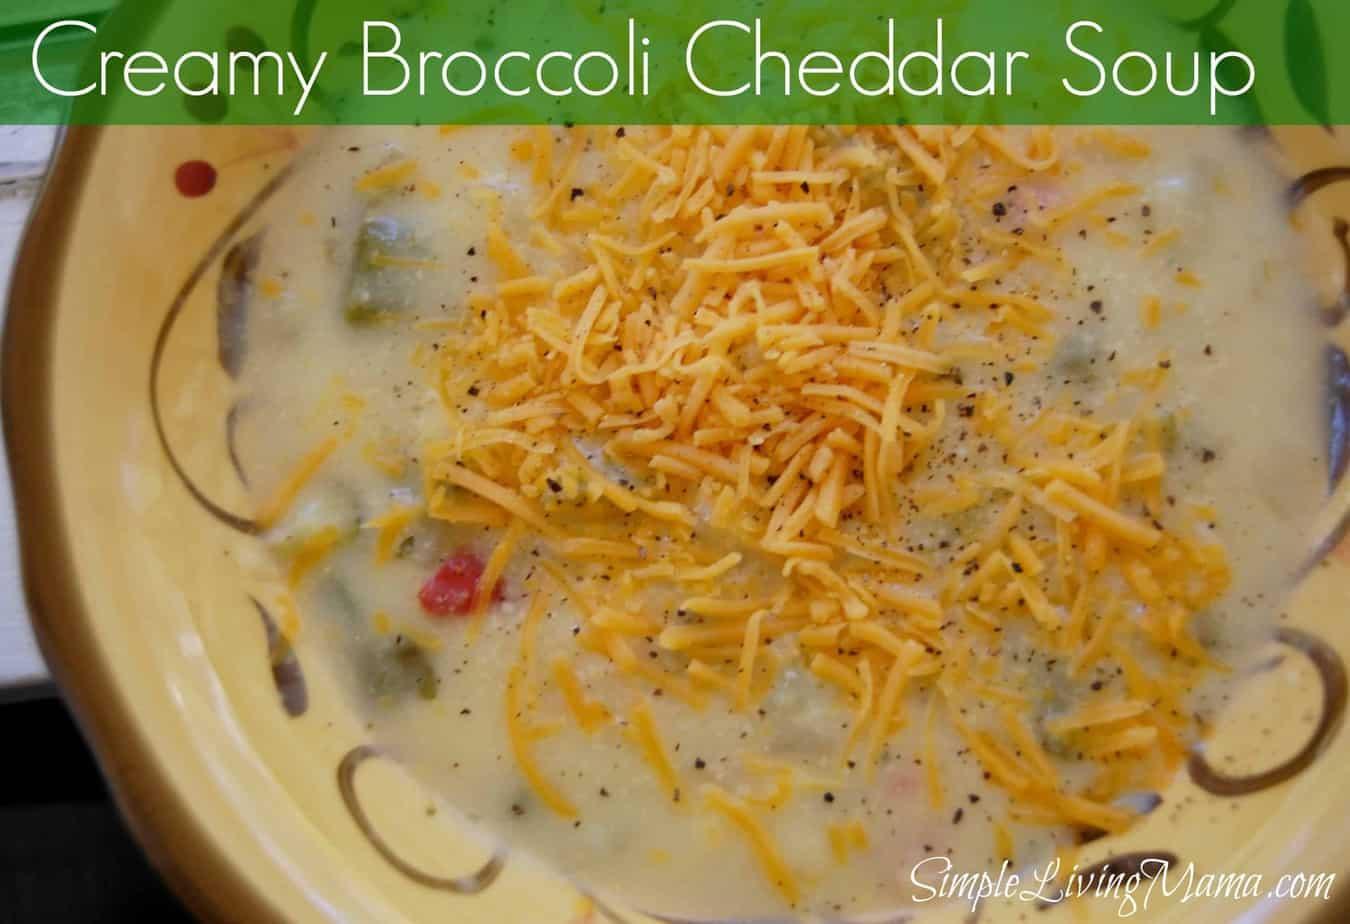 Broccoli Cheddar Soup - Frugal Food Friday - Simple Living Mama